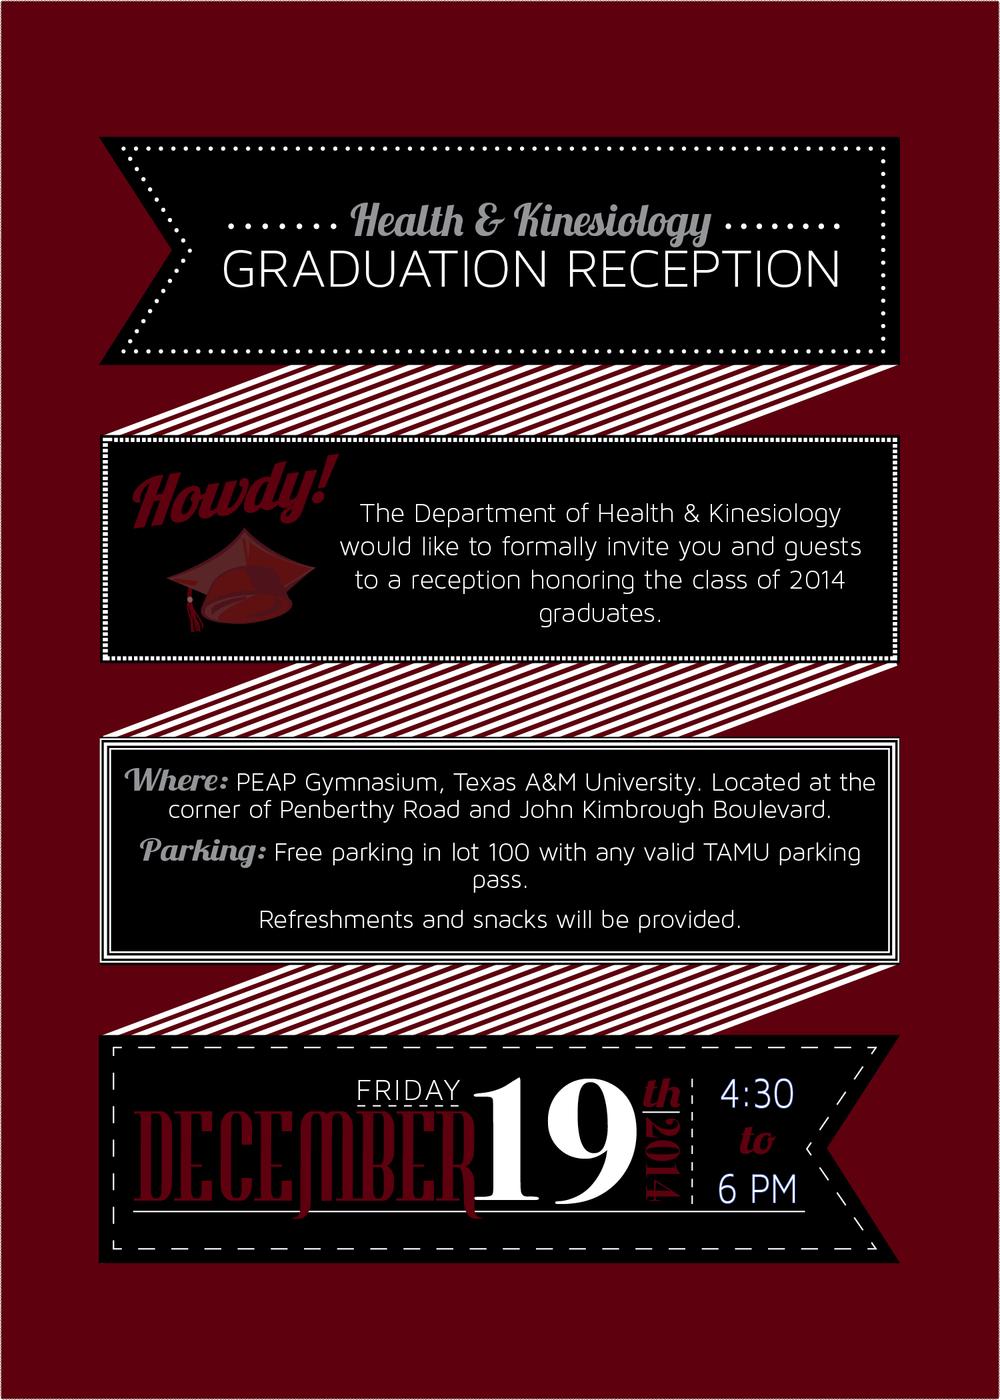 Health & Kinesiology Graduation.jpg